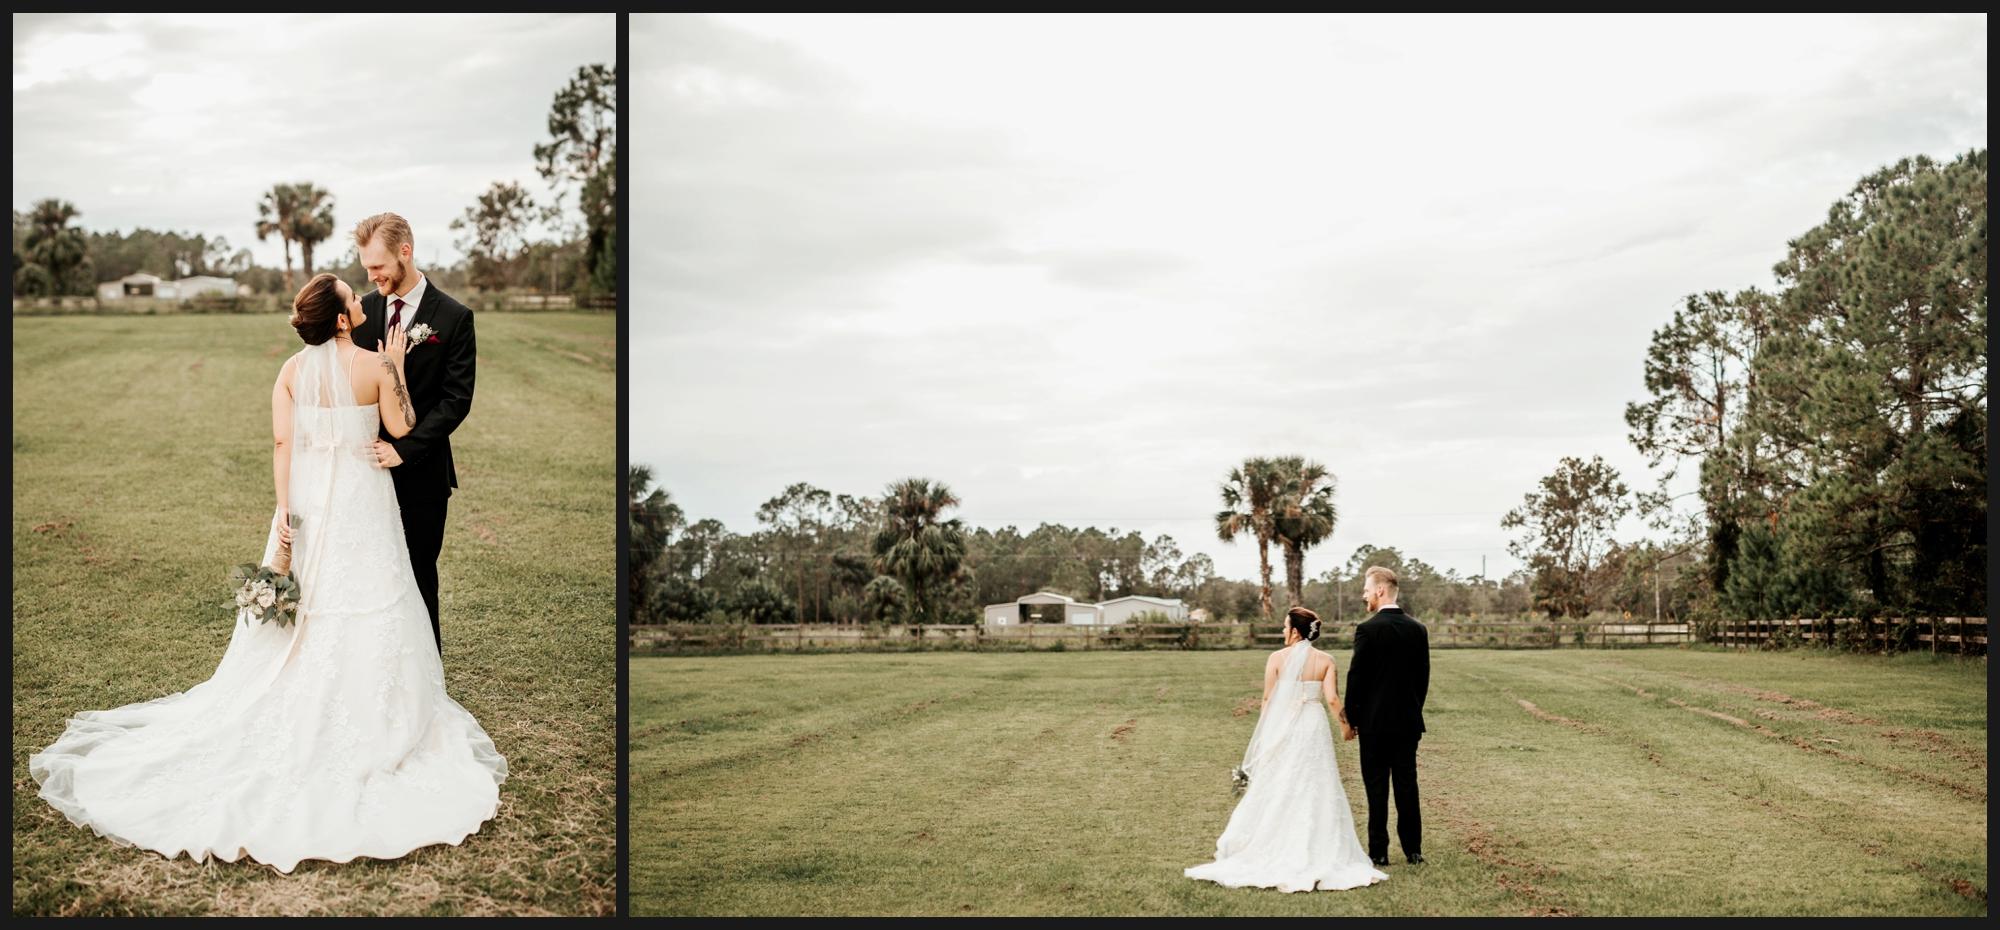 Orlando-Wedding-Photographer-destination-wedding-photographer-florida-wedding-photographer-bohemian-wedding-photographer_0293.jpg